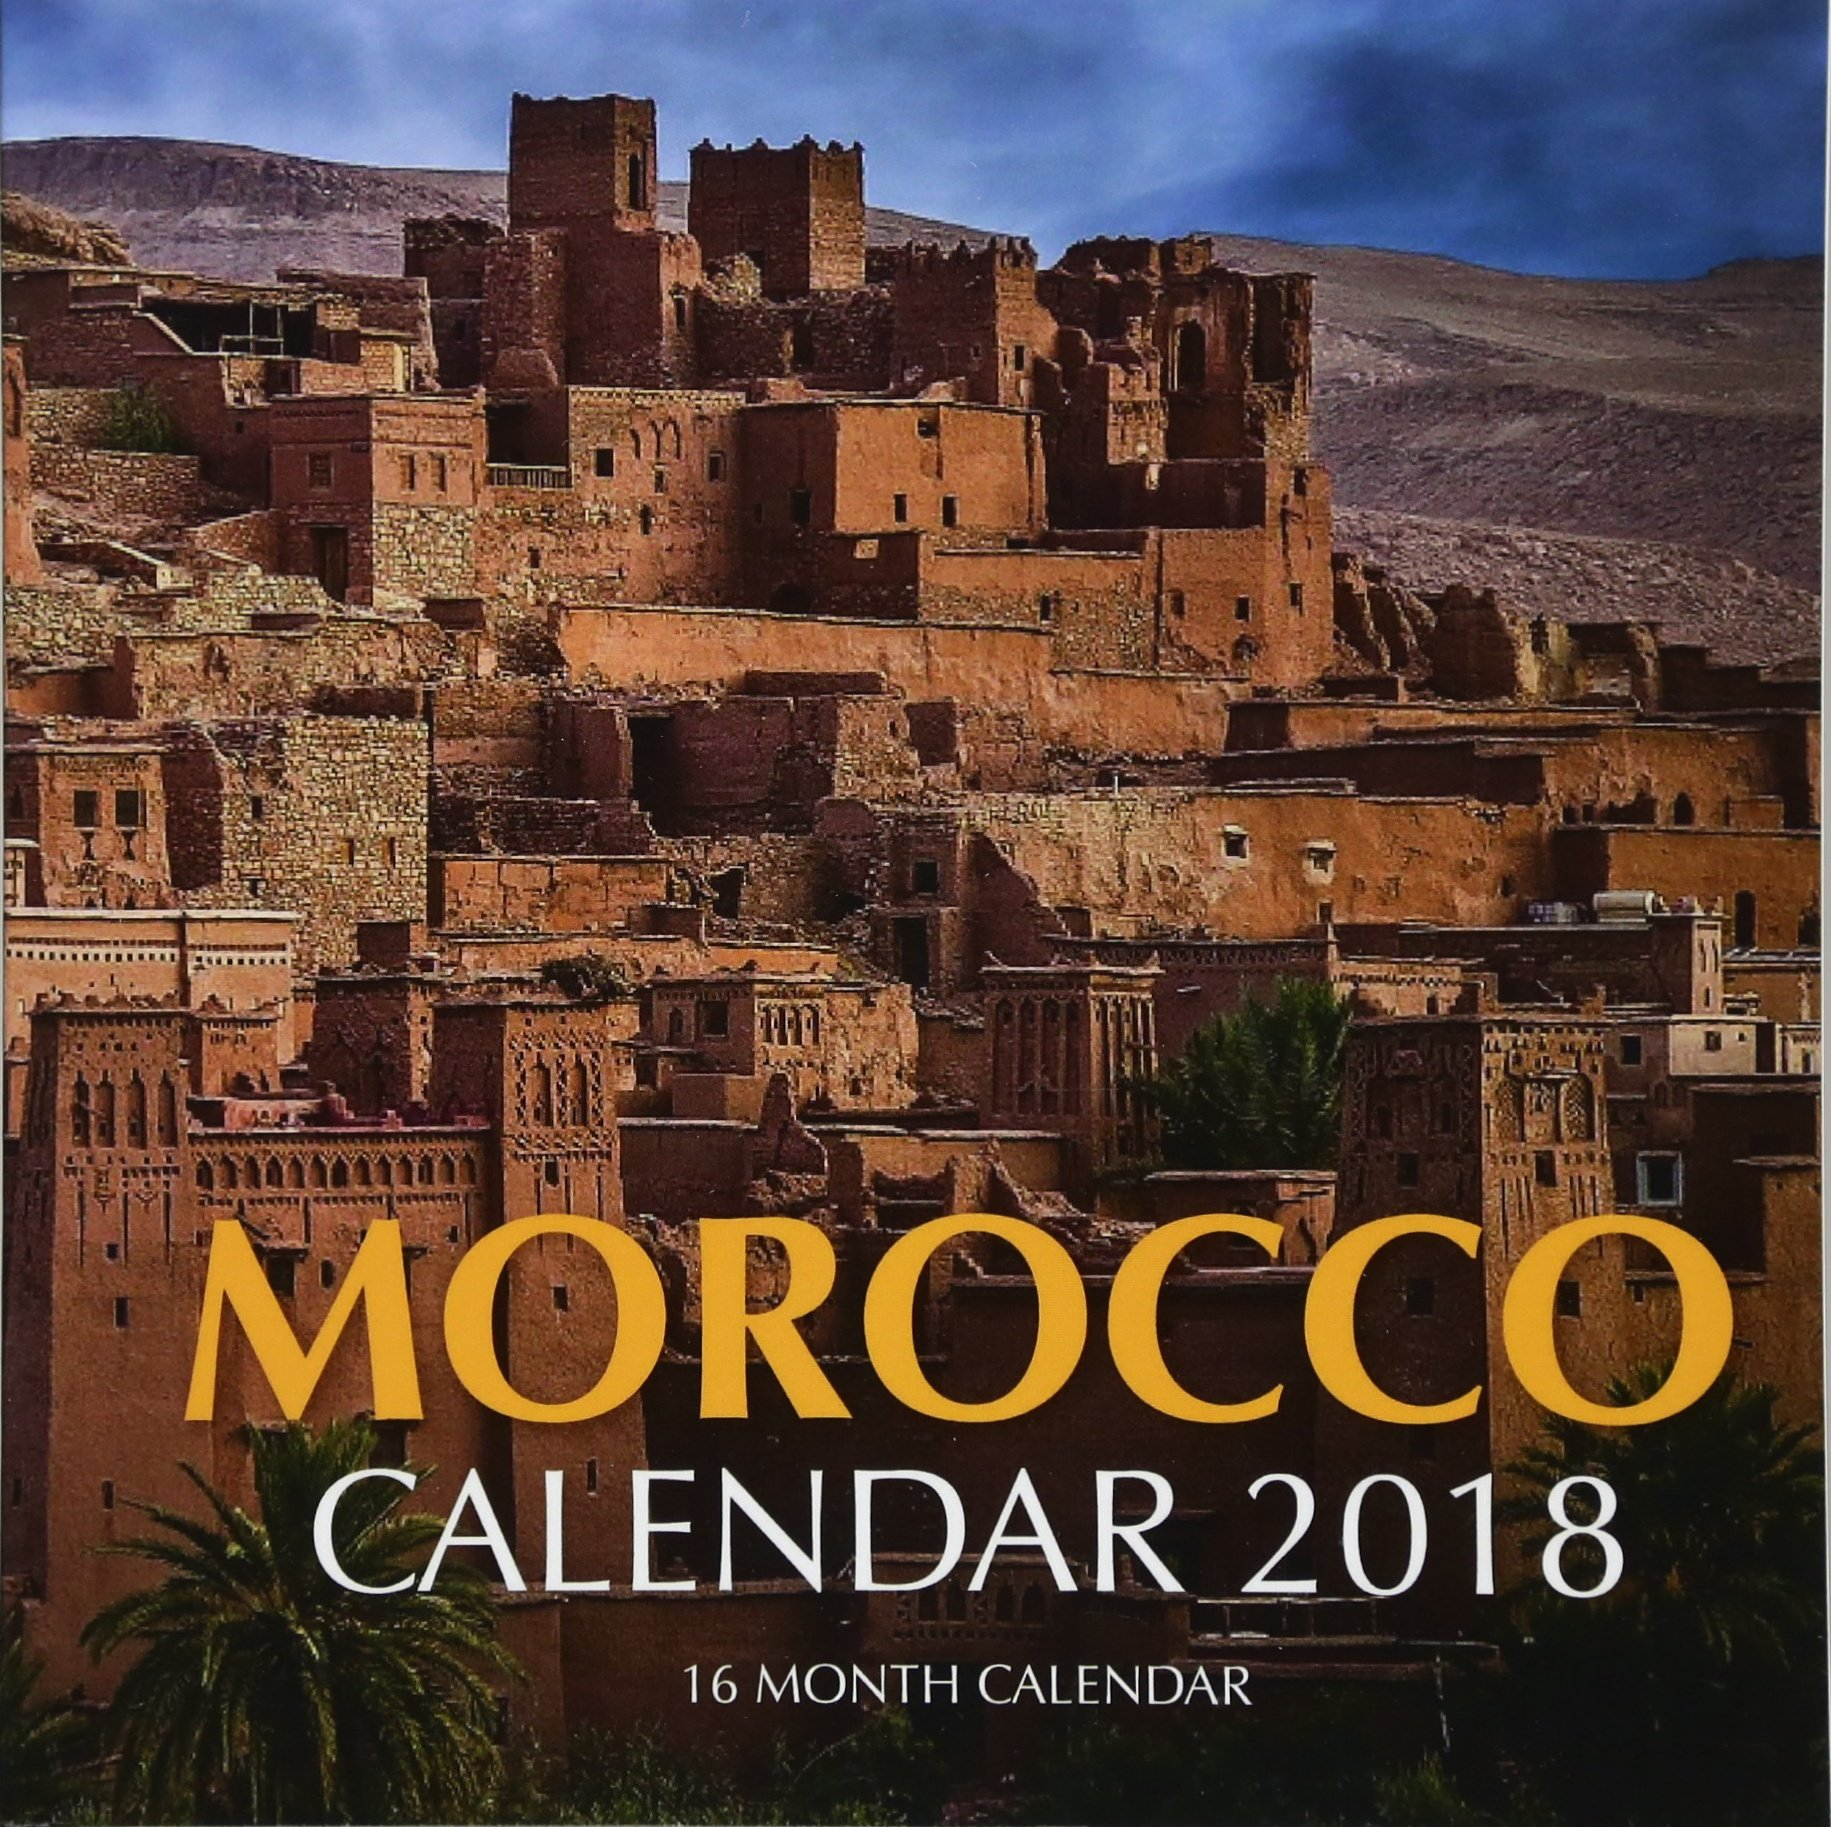 Morocco Calendar 2018: 16 Month Calendar